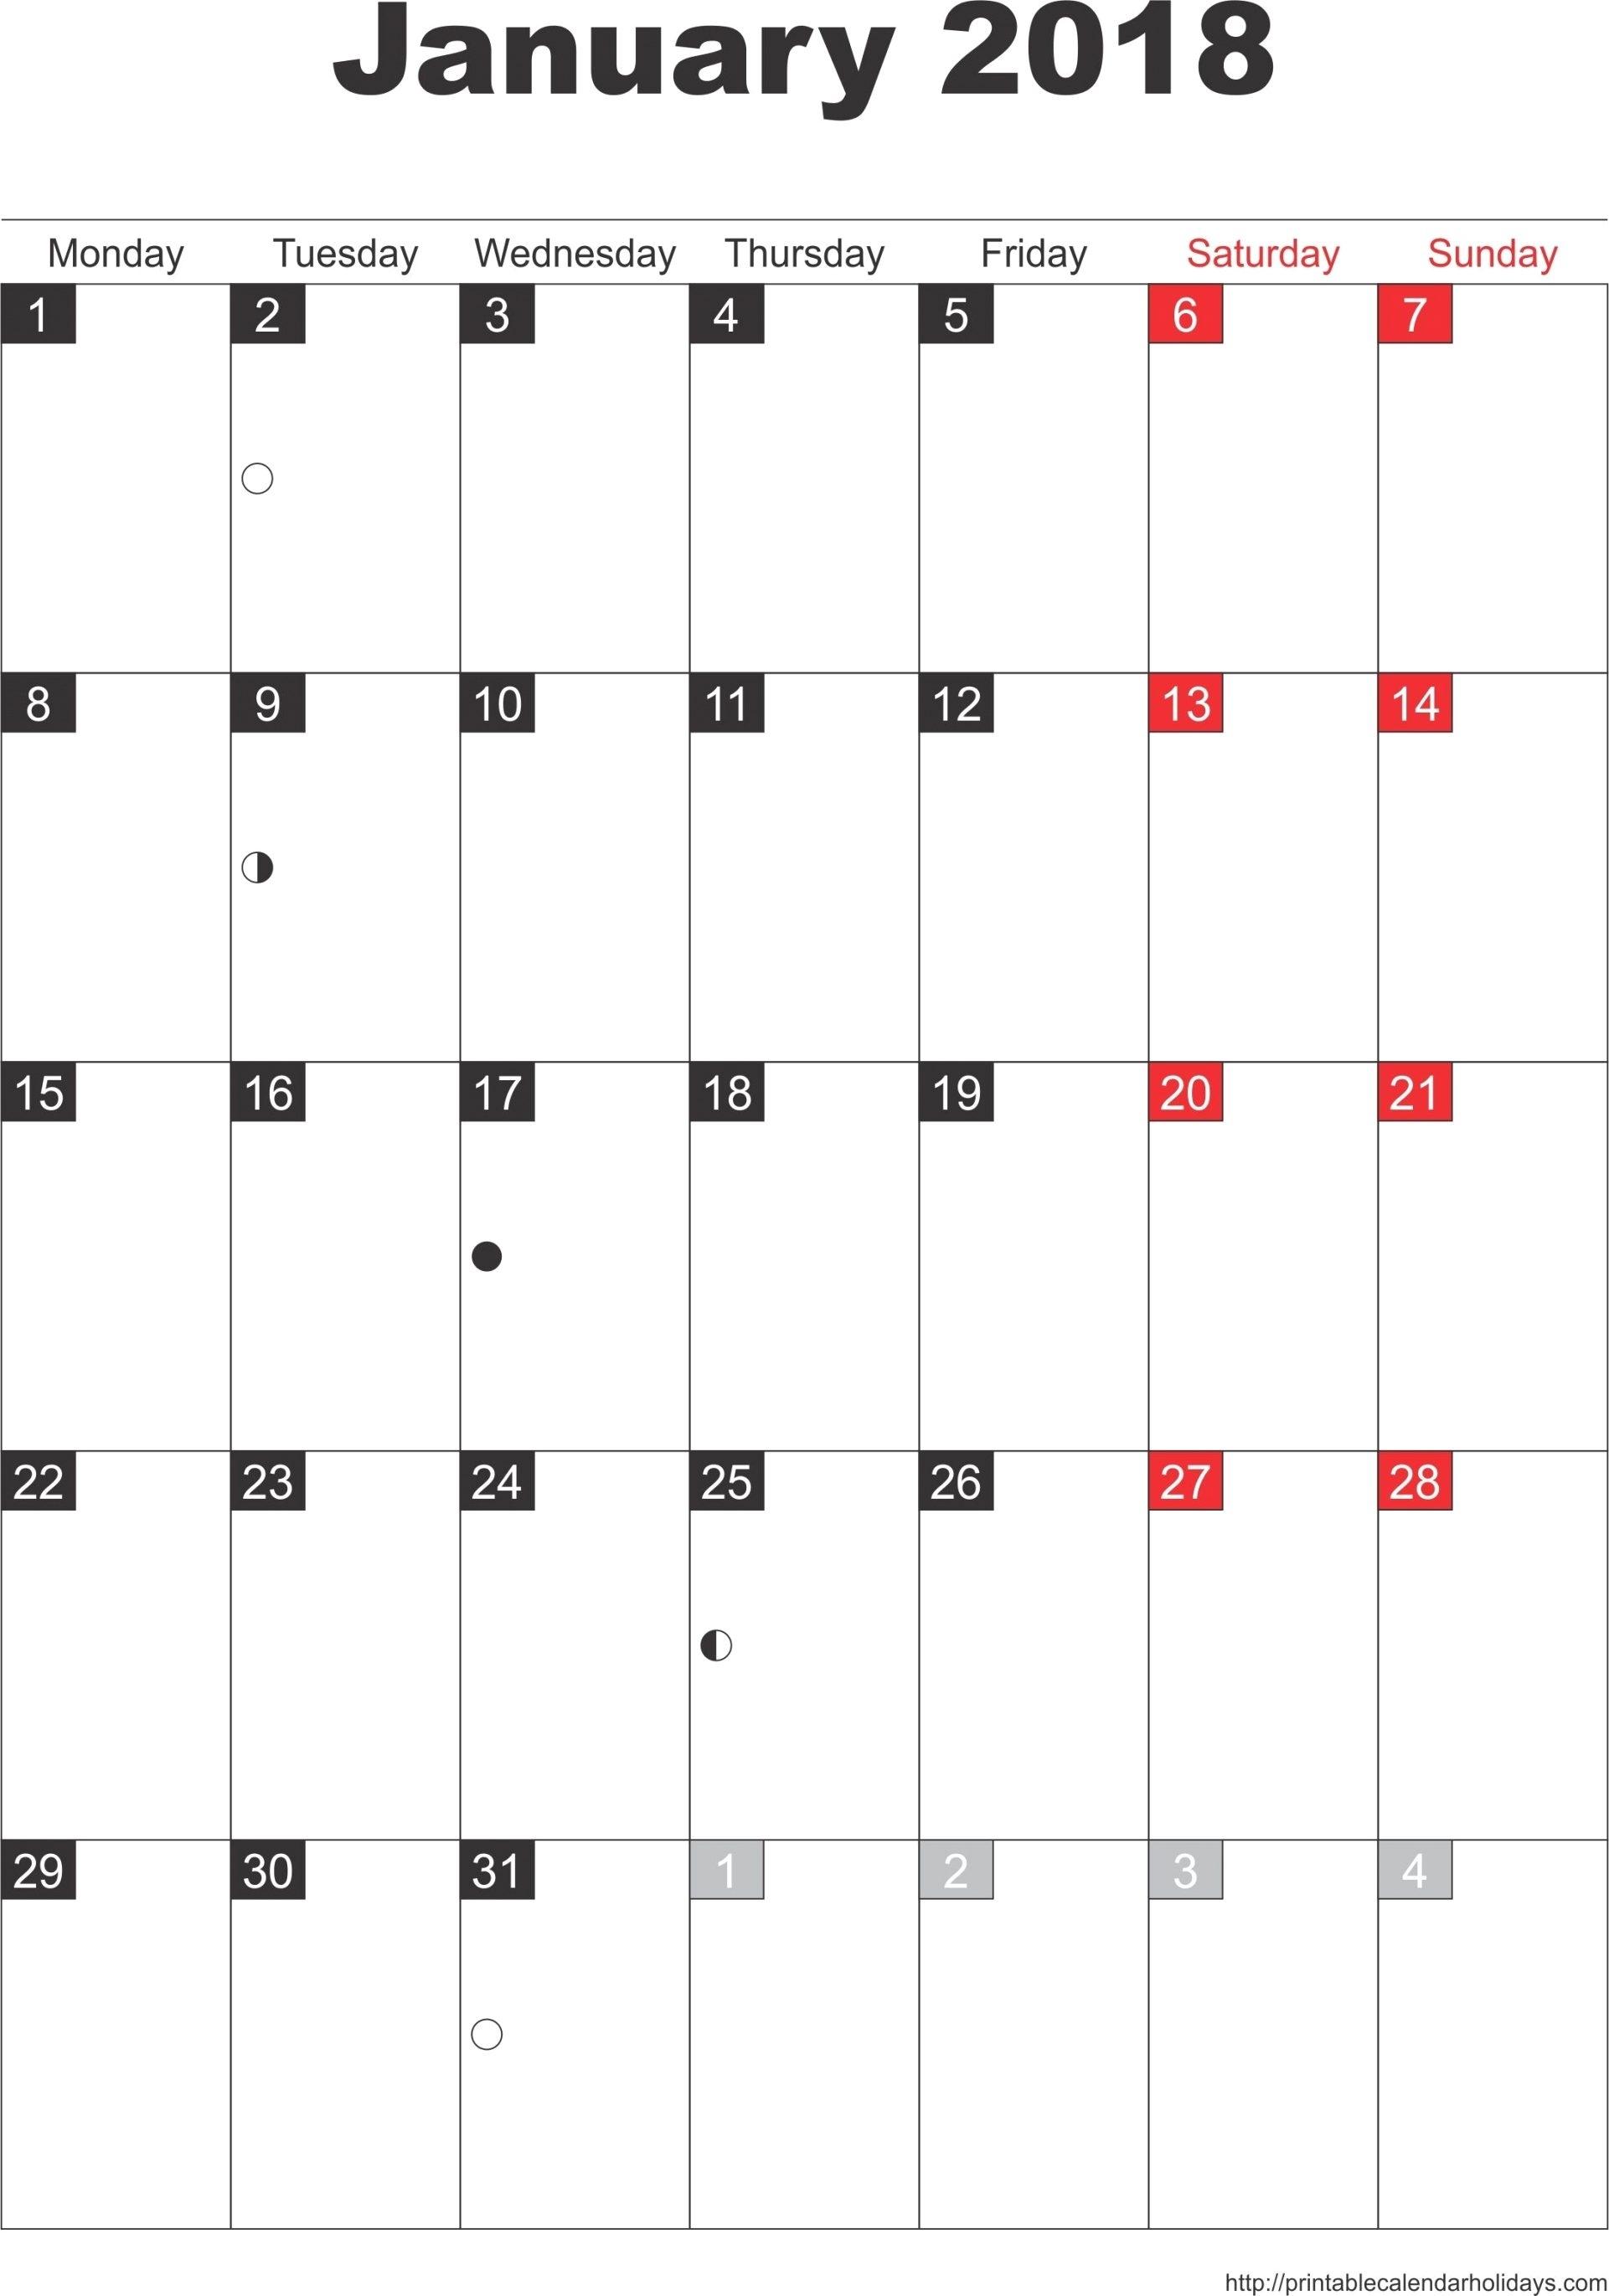 Year Calendar 2018 2019 2018 Printable 2018 2019 Best Cars